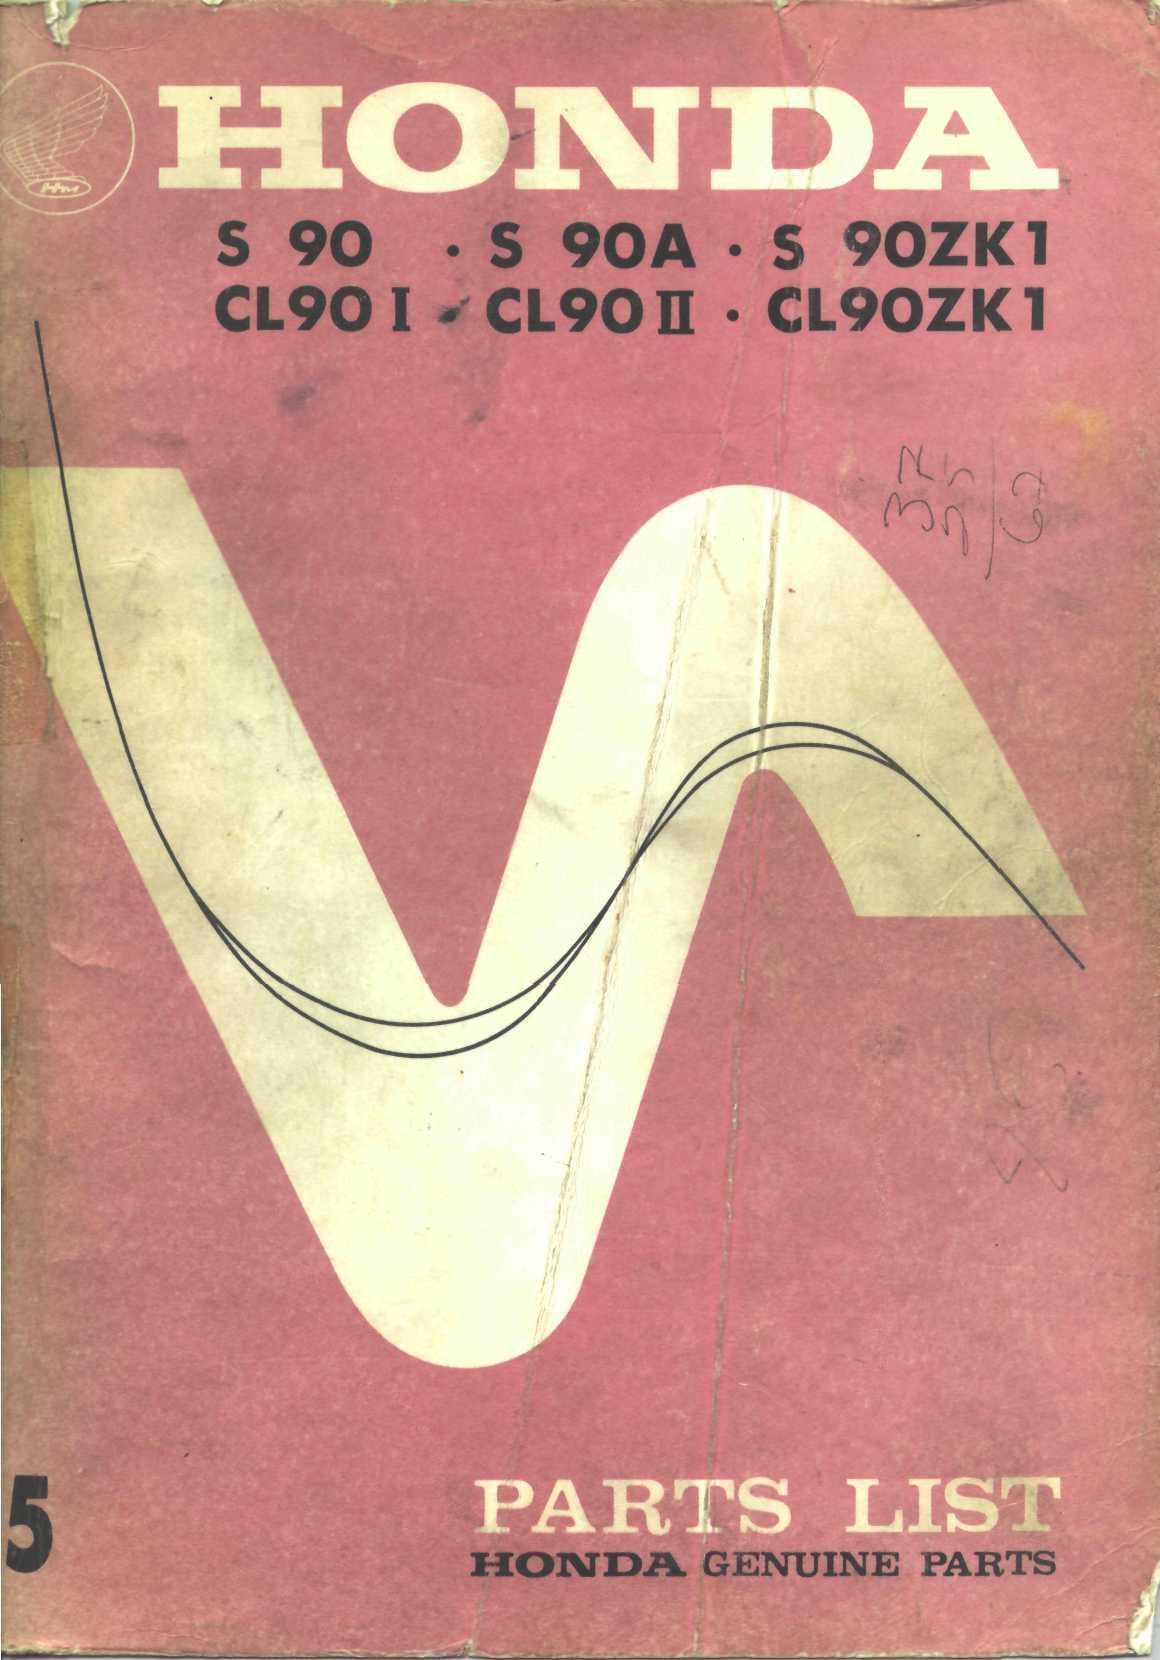 Workshopmanual for Honda S90ZK1 (1972)